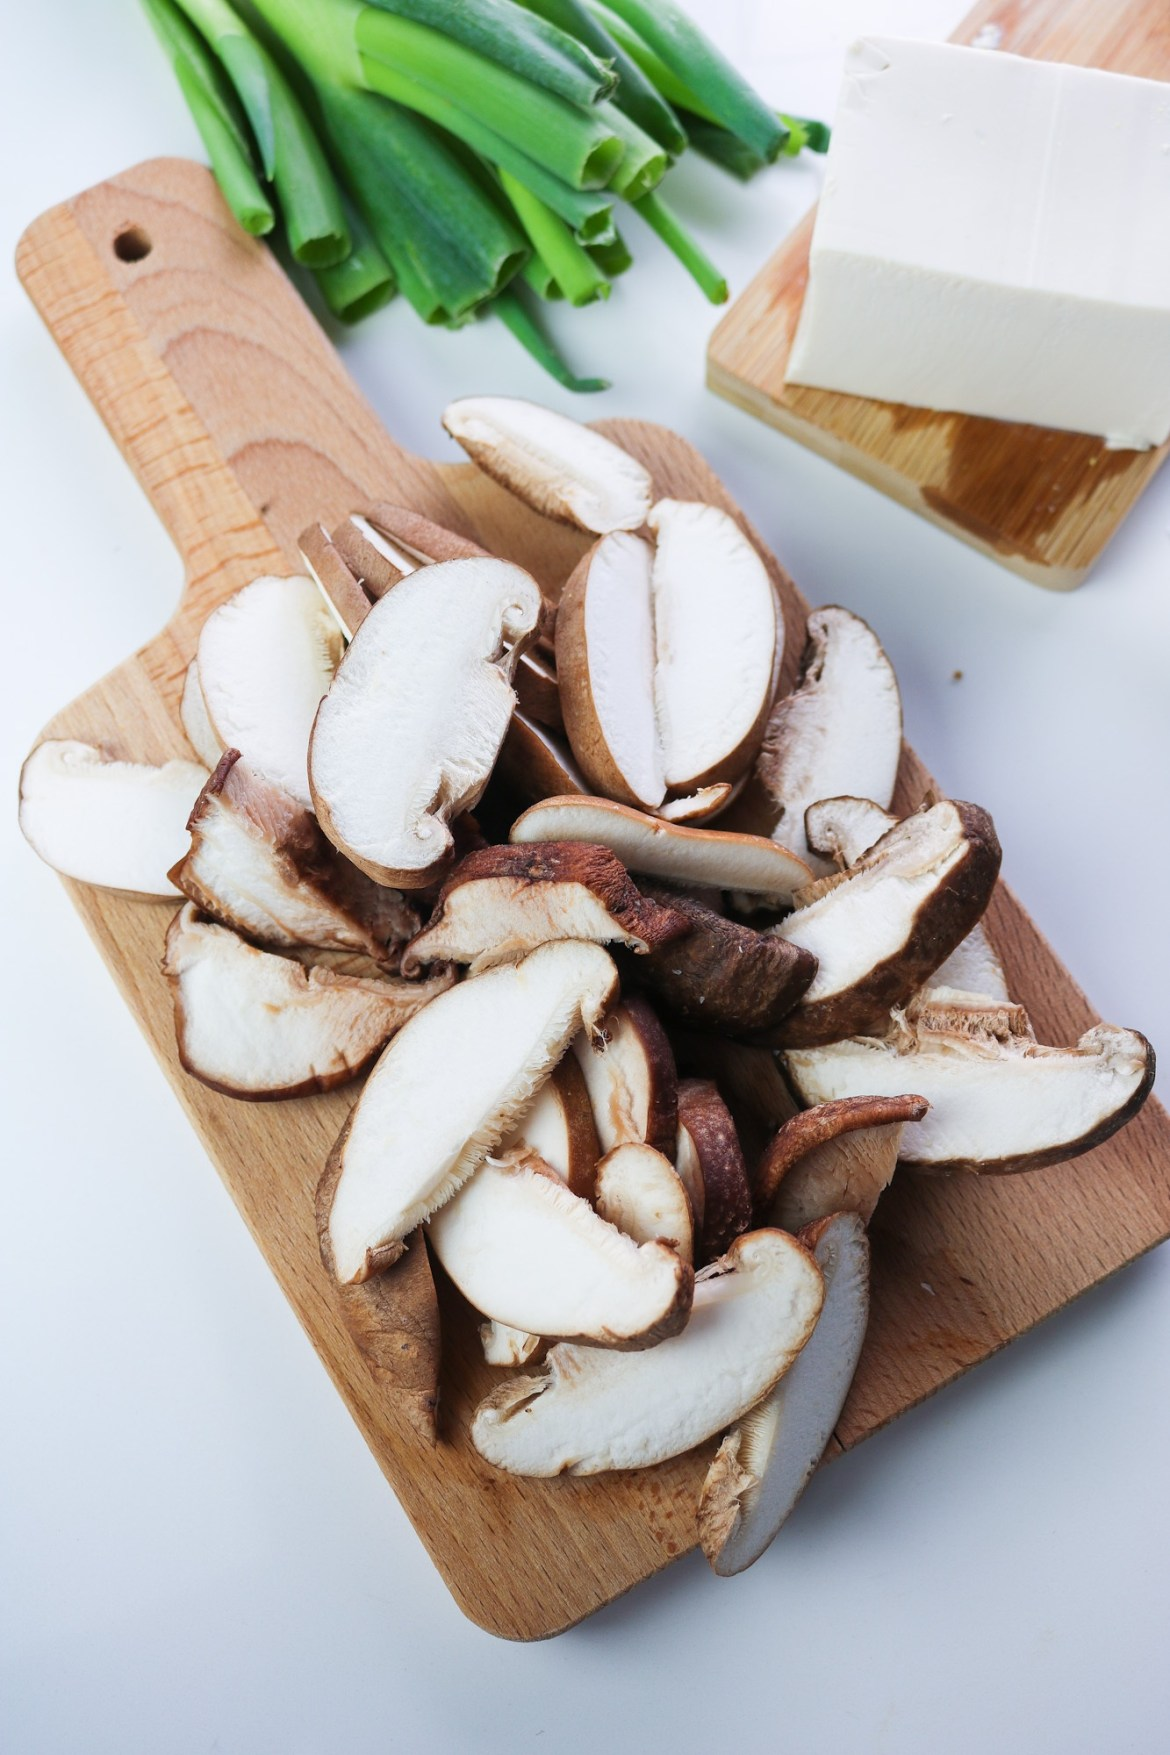 chopped shiitake mushrooms on a wooden board